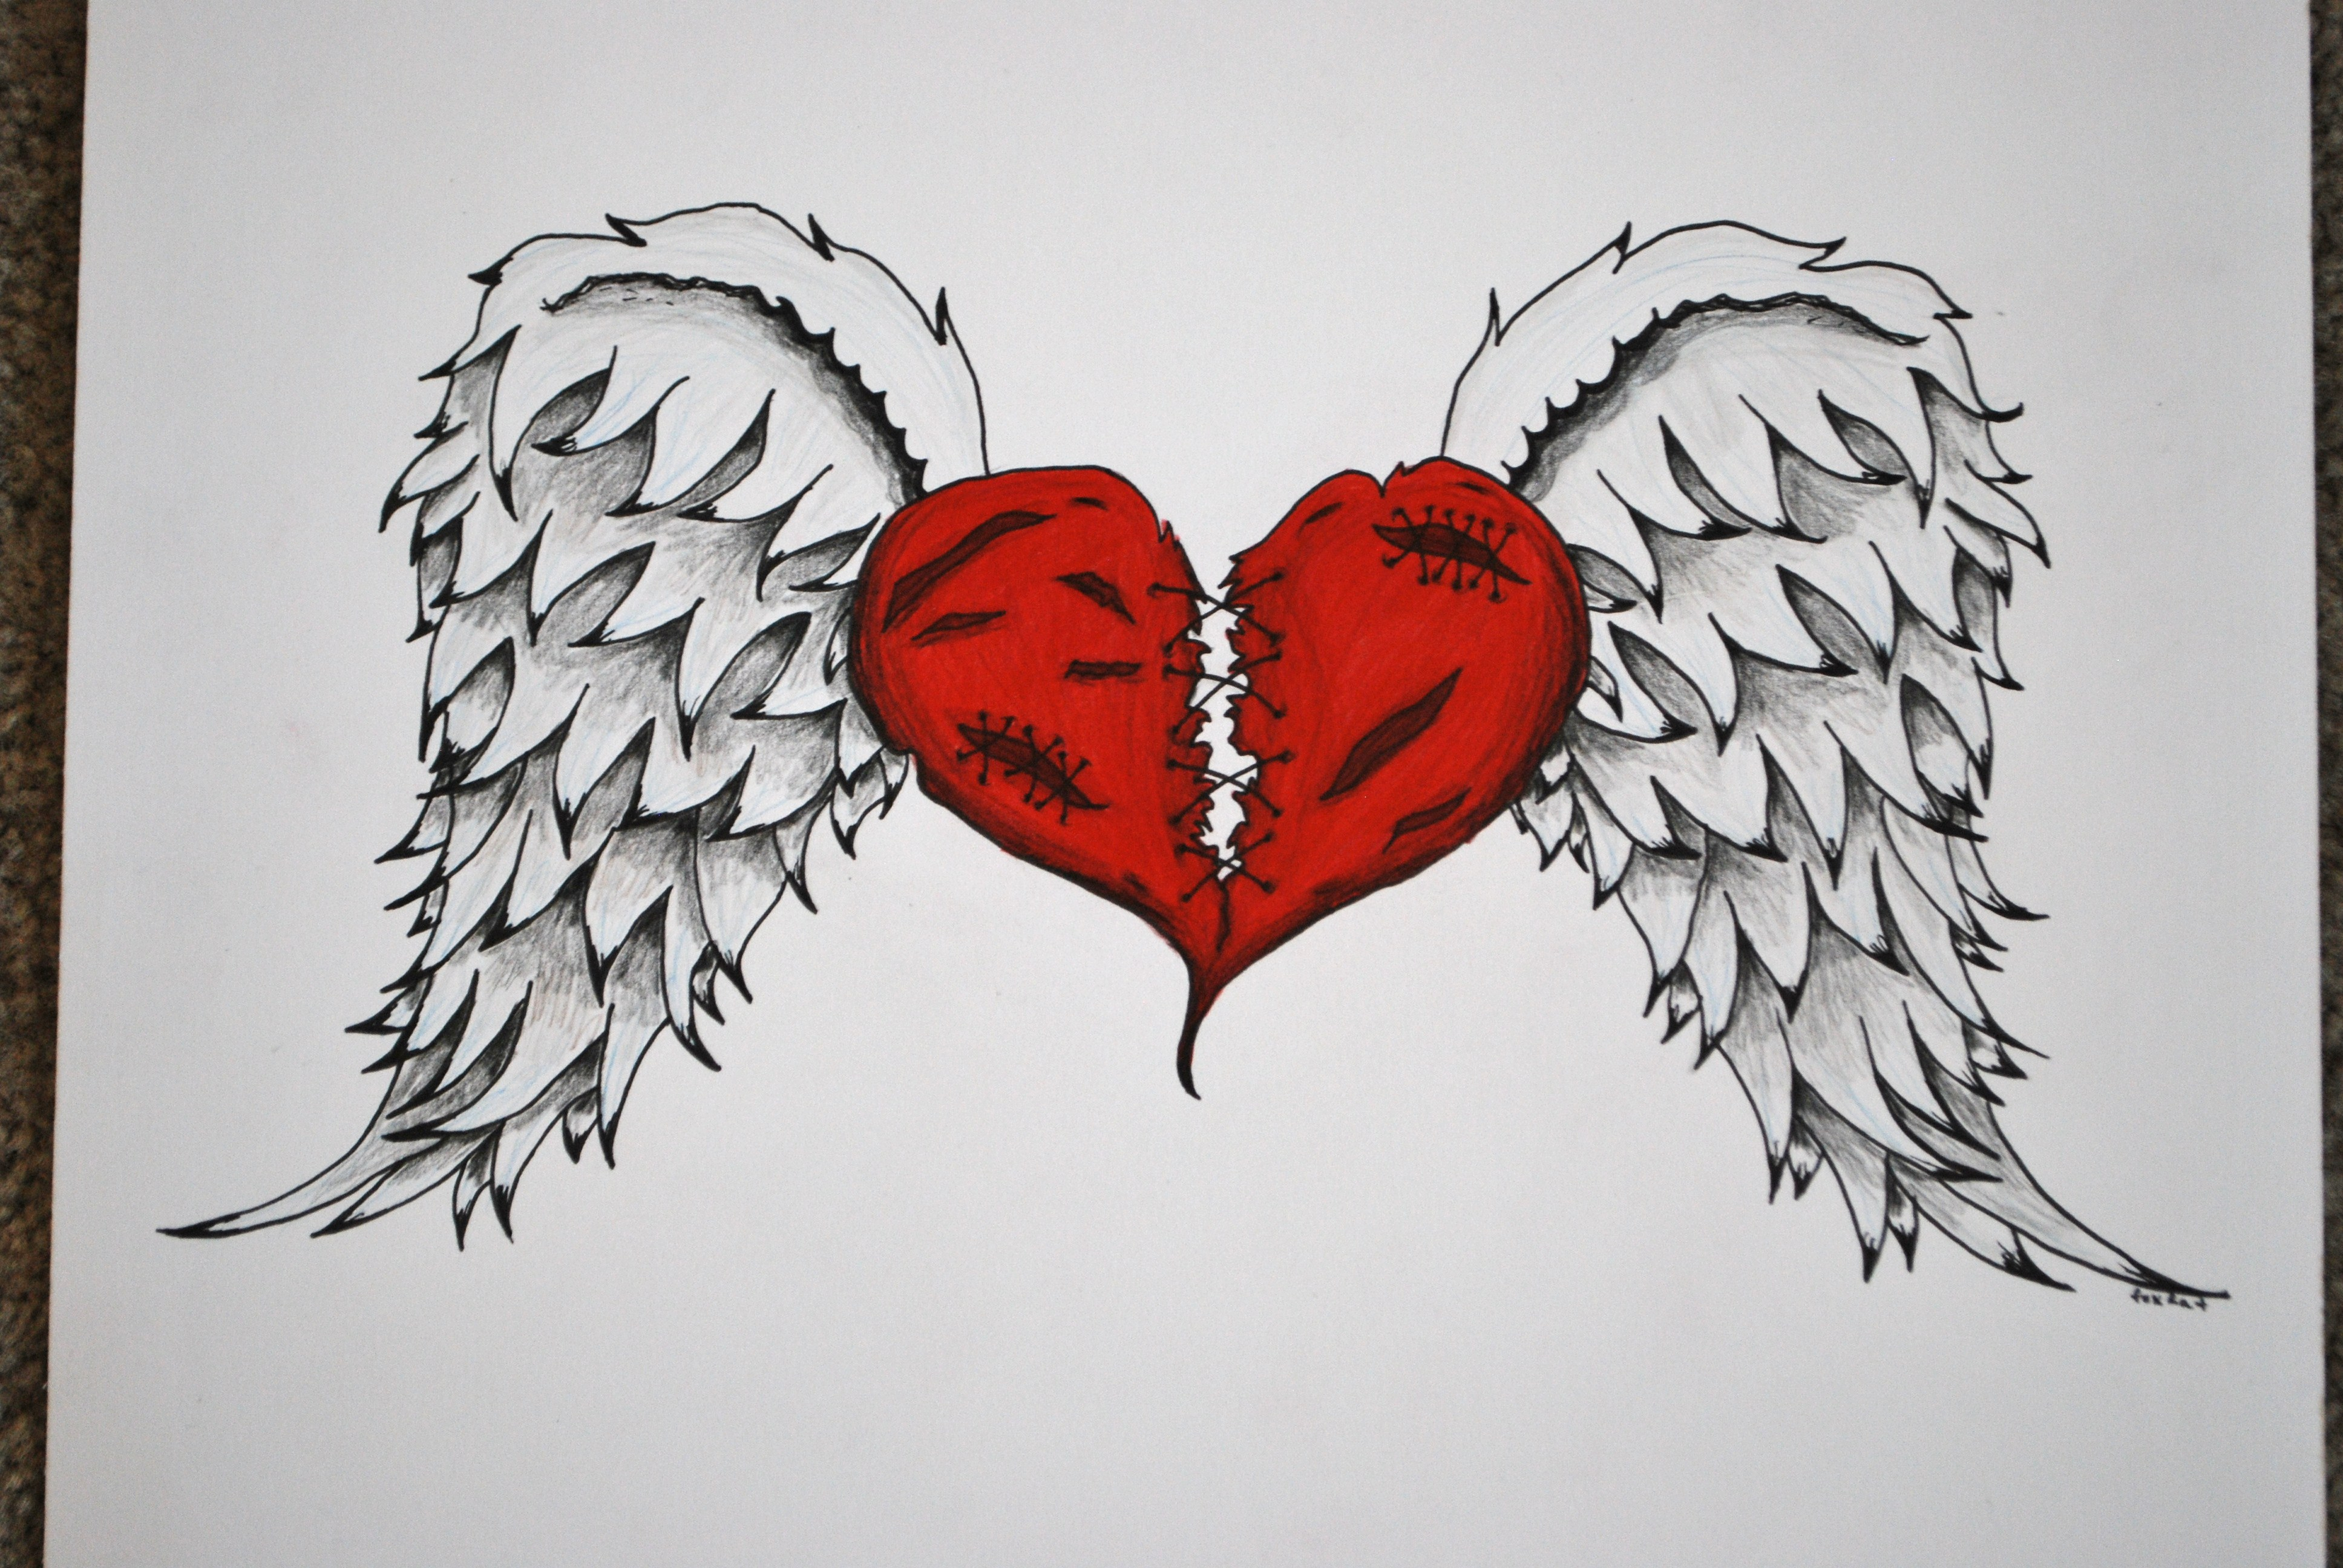 'Broken Heart' Commission by foxkat on DeviantArt